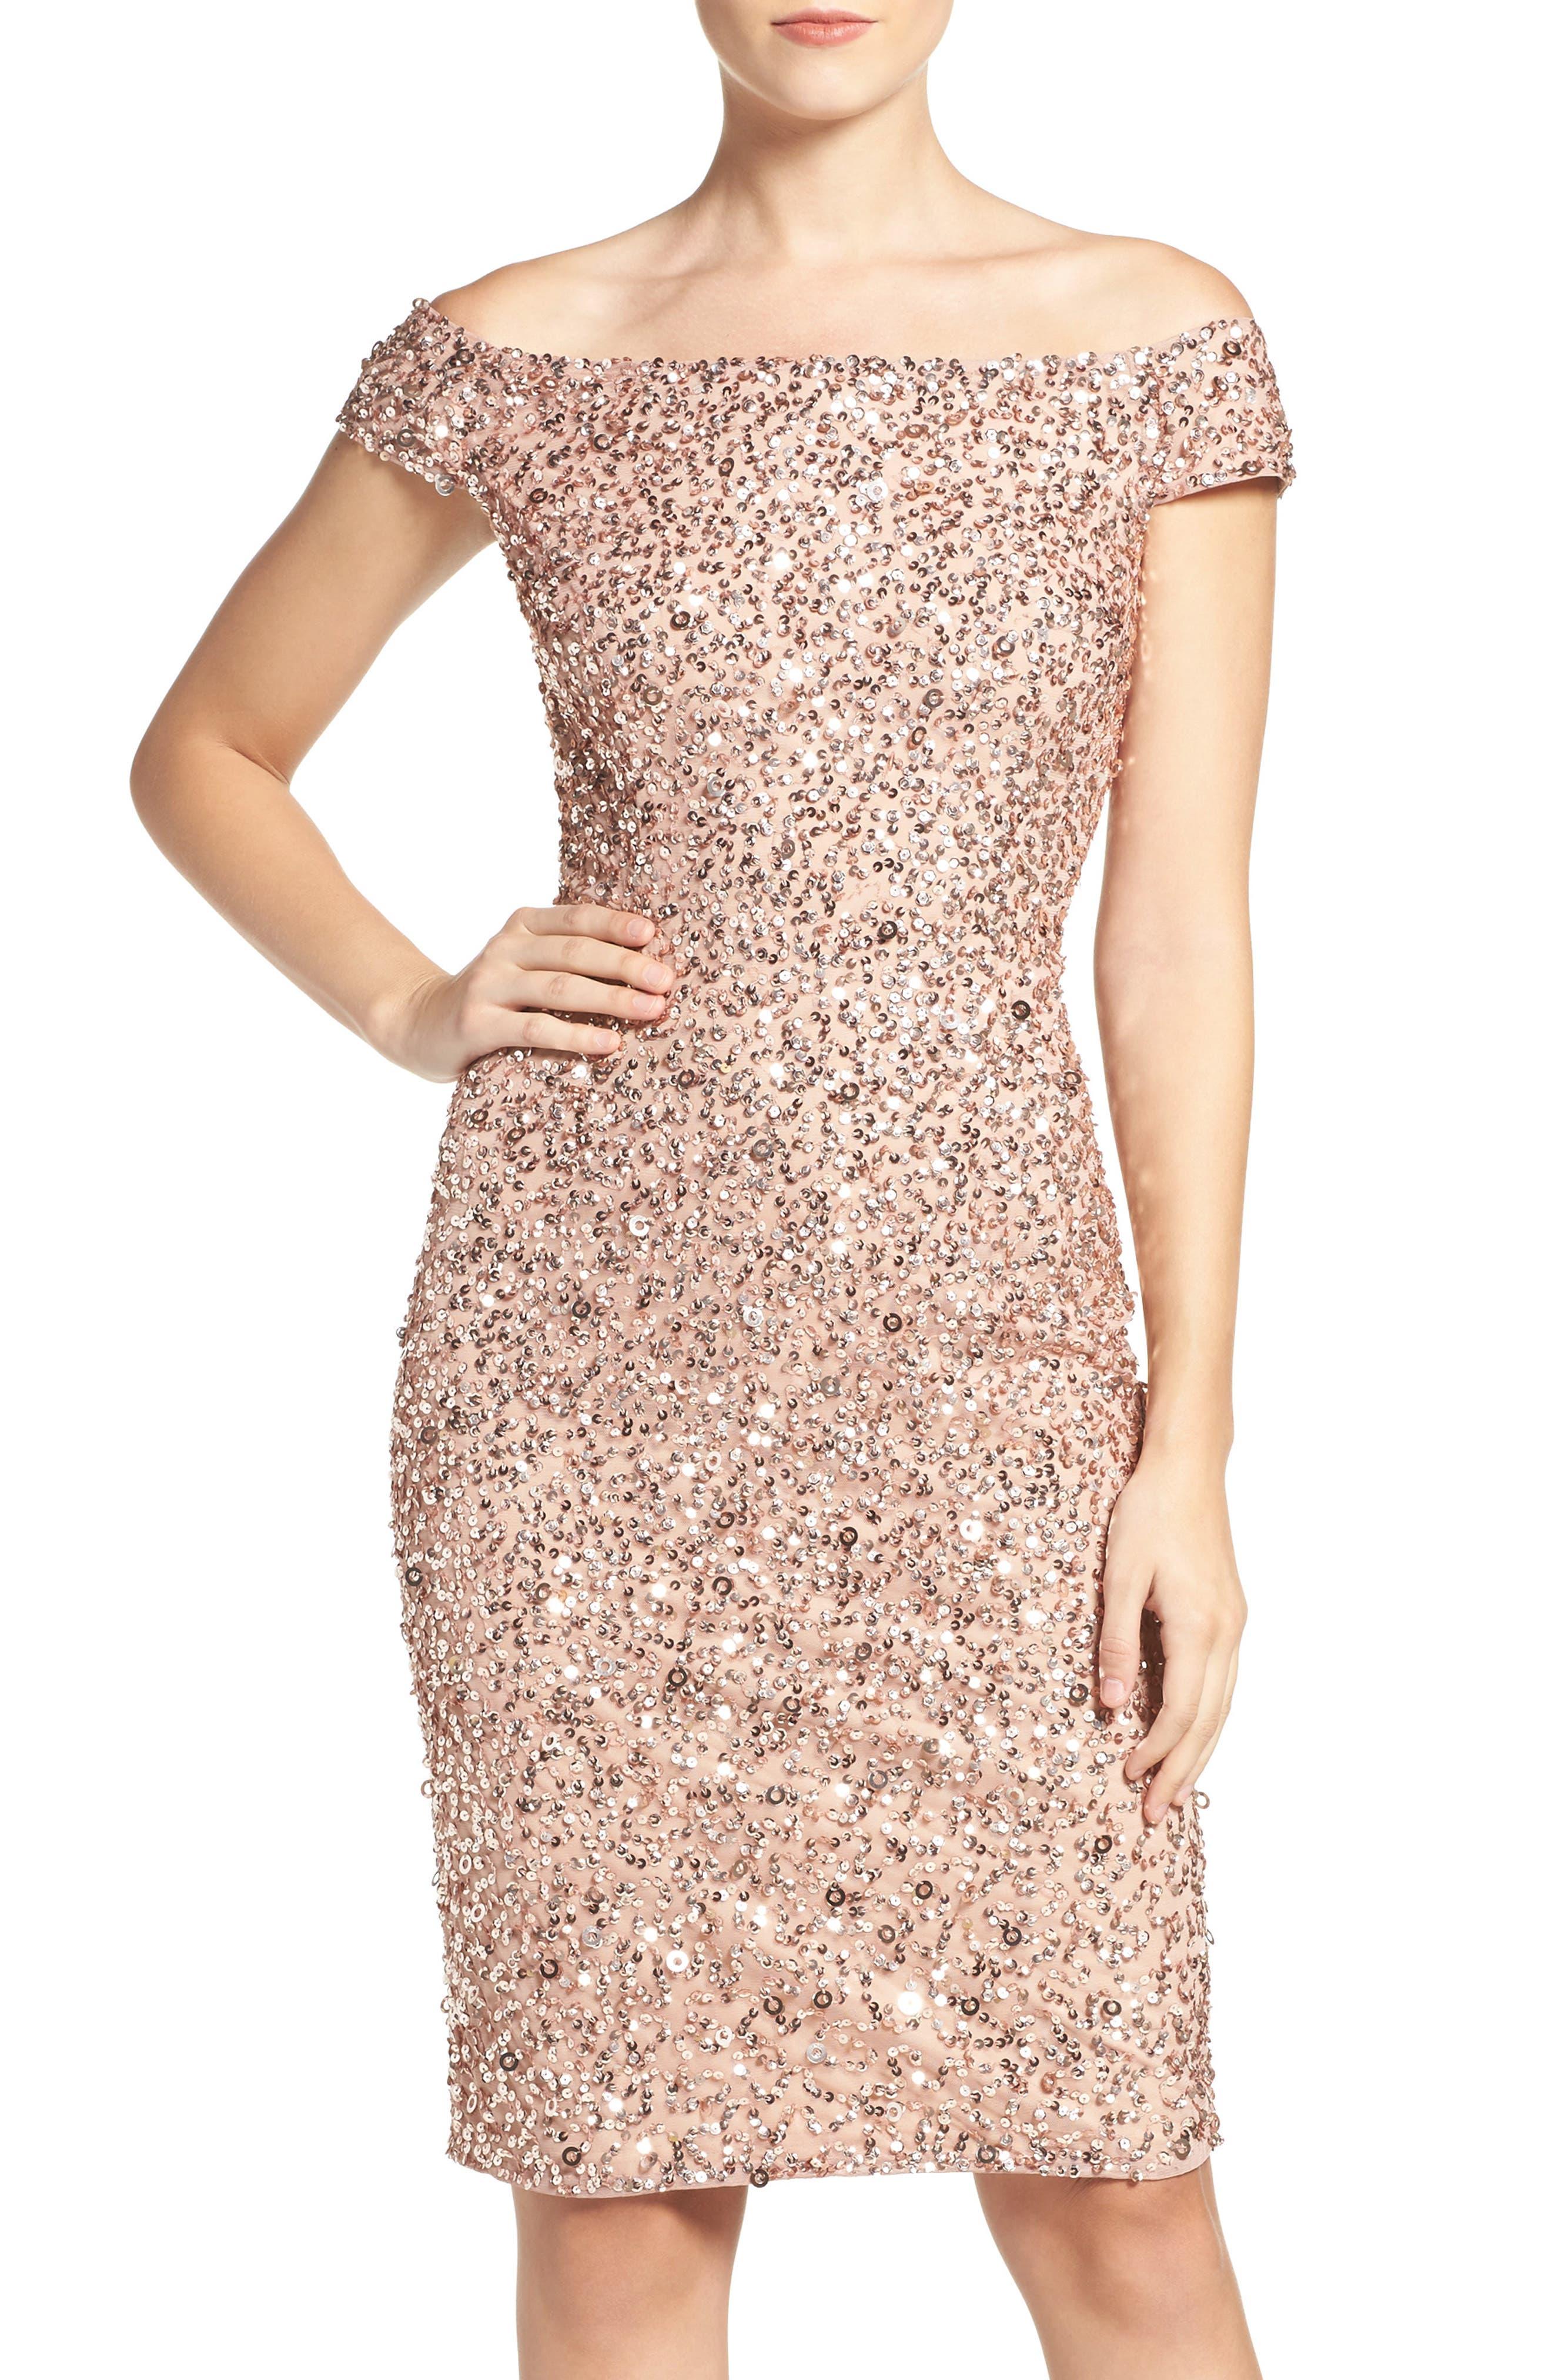 Alternate Image 1 Selected - Adrianna Papell Off the Shoulder Sequin Sheath Dress (Regular & Petite)